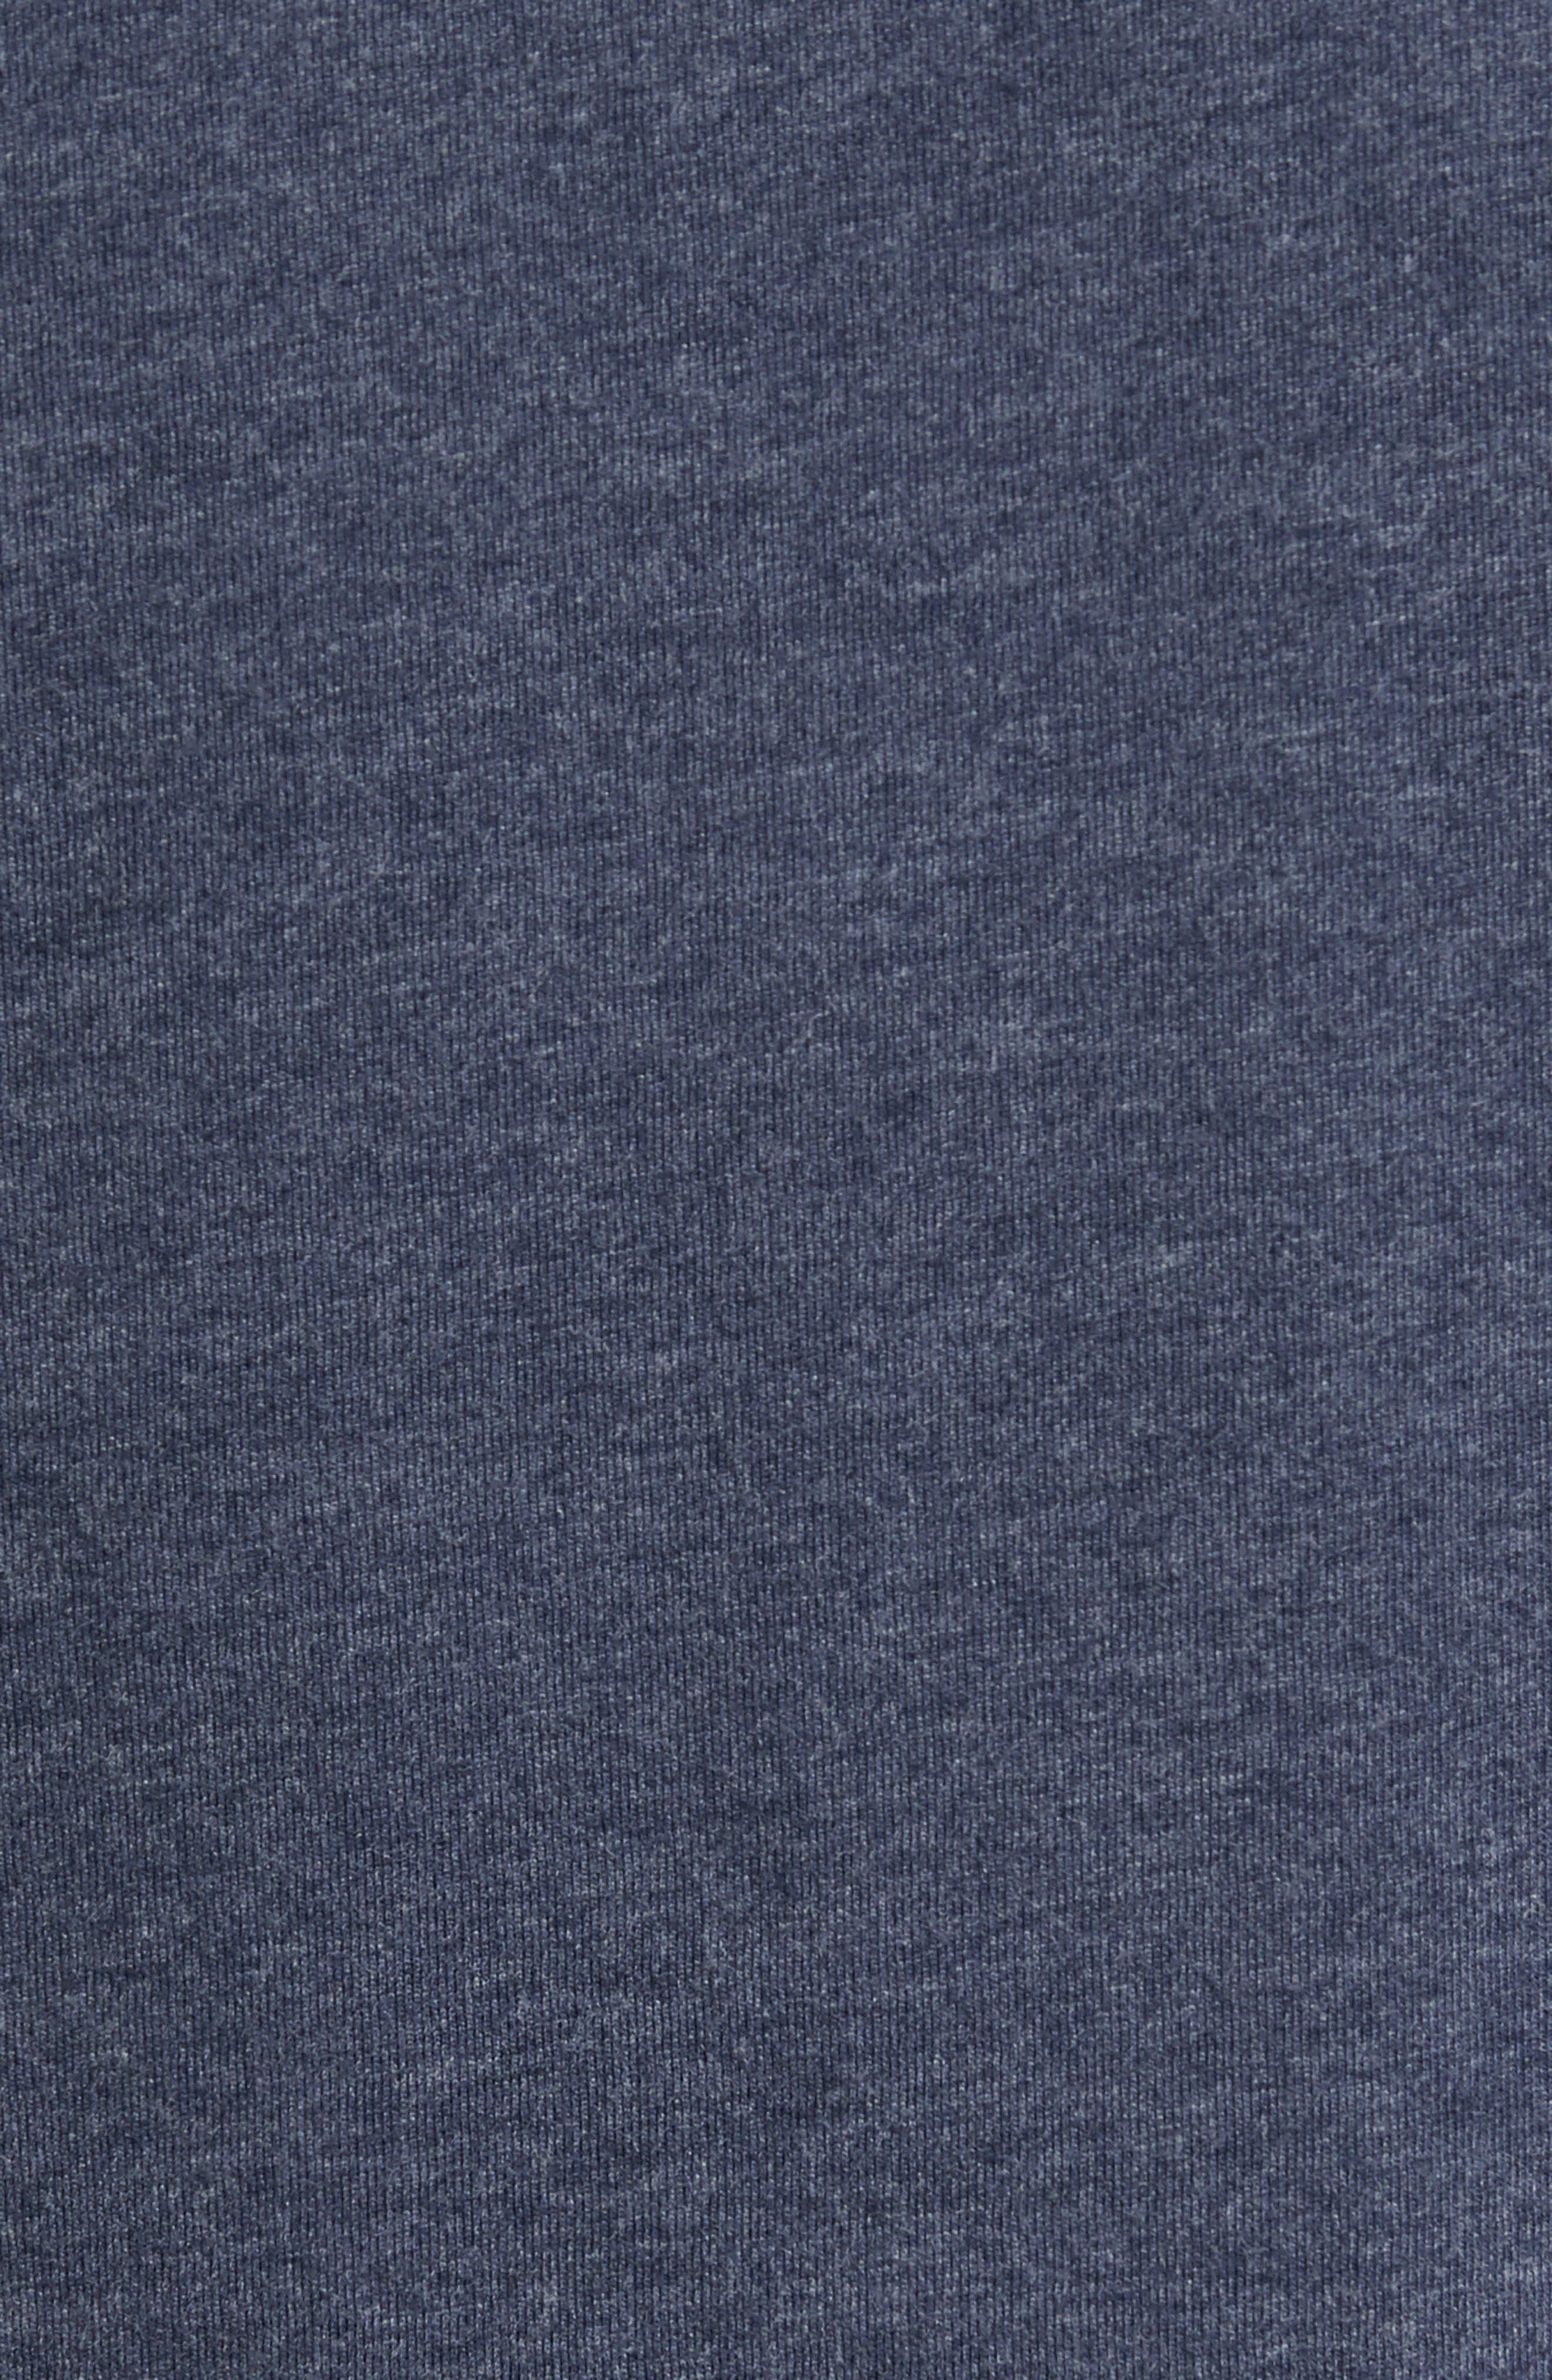 Notch Long Sleeve T-Shirt,                             Alternate thumbnail 10, color,